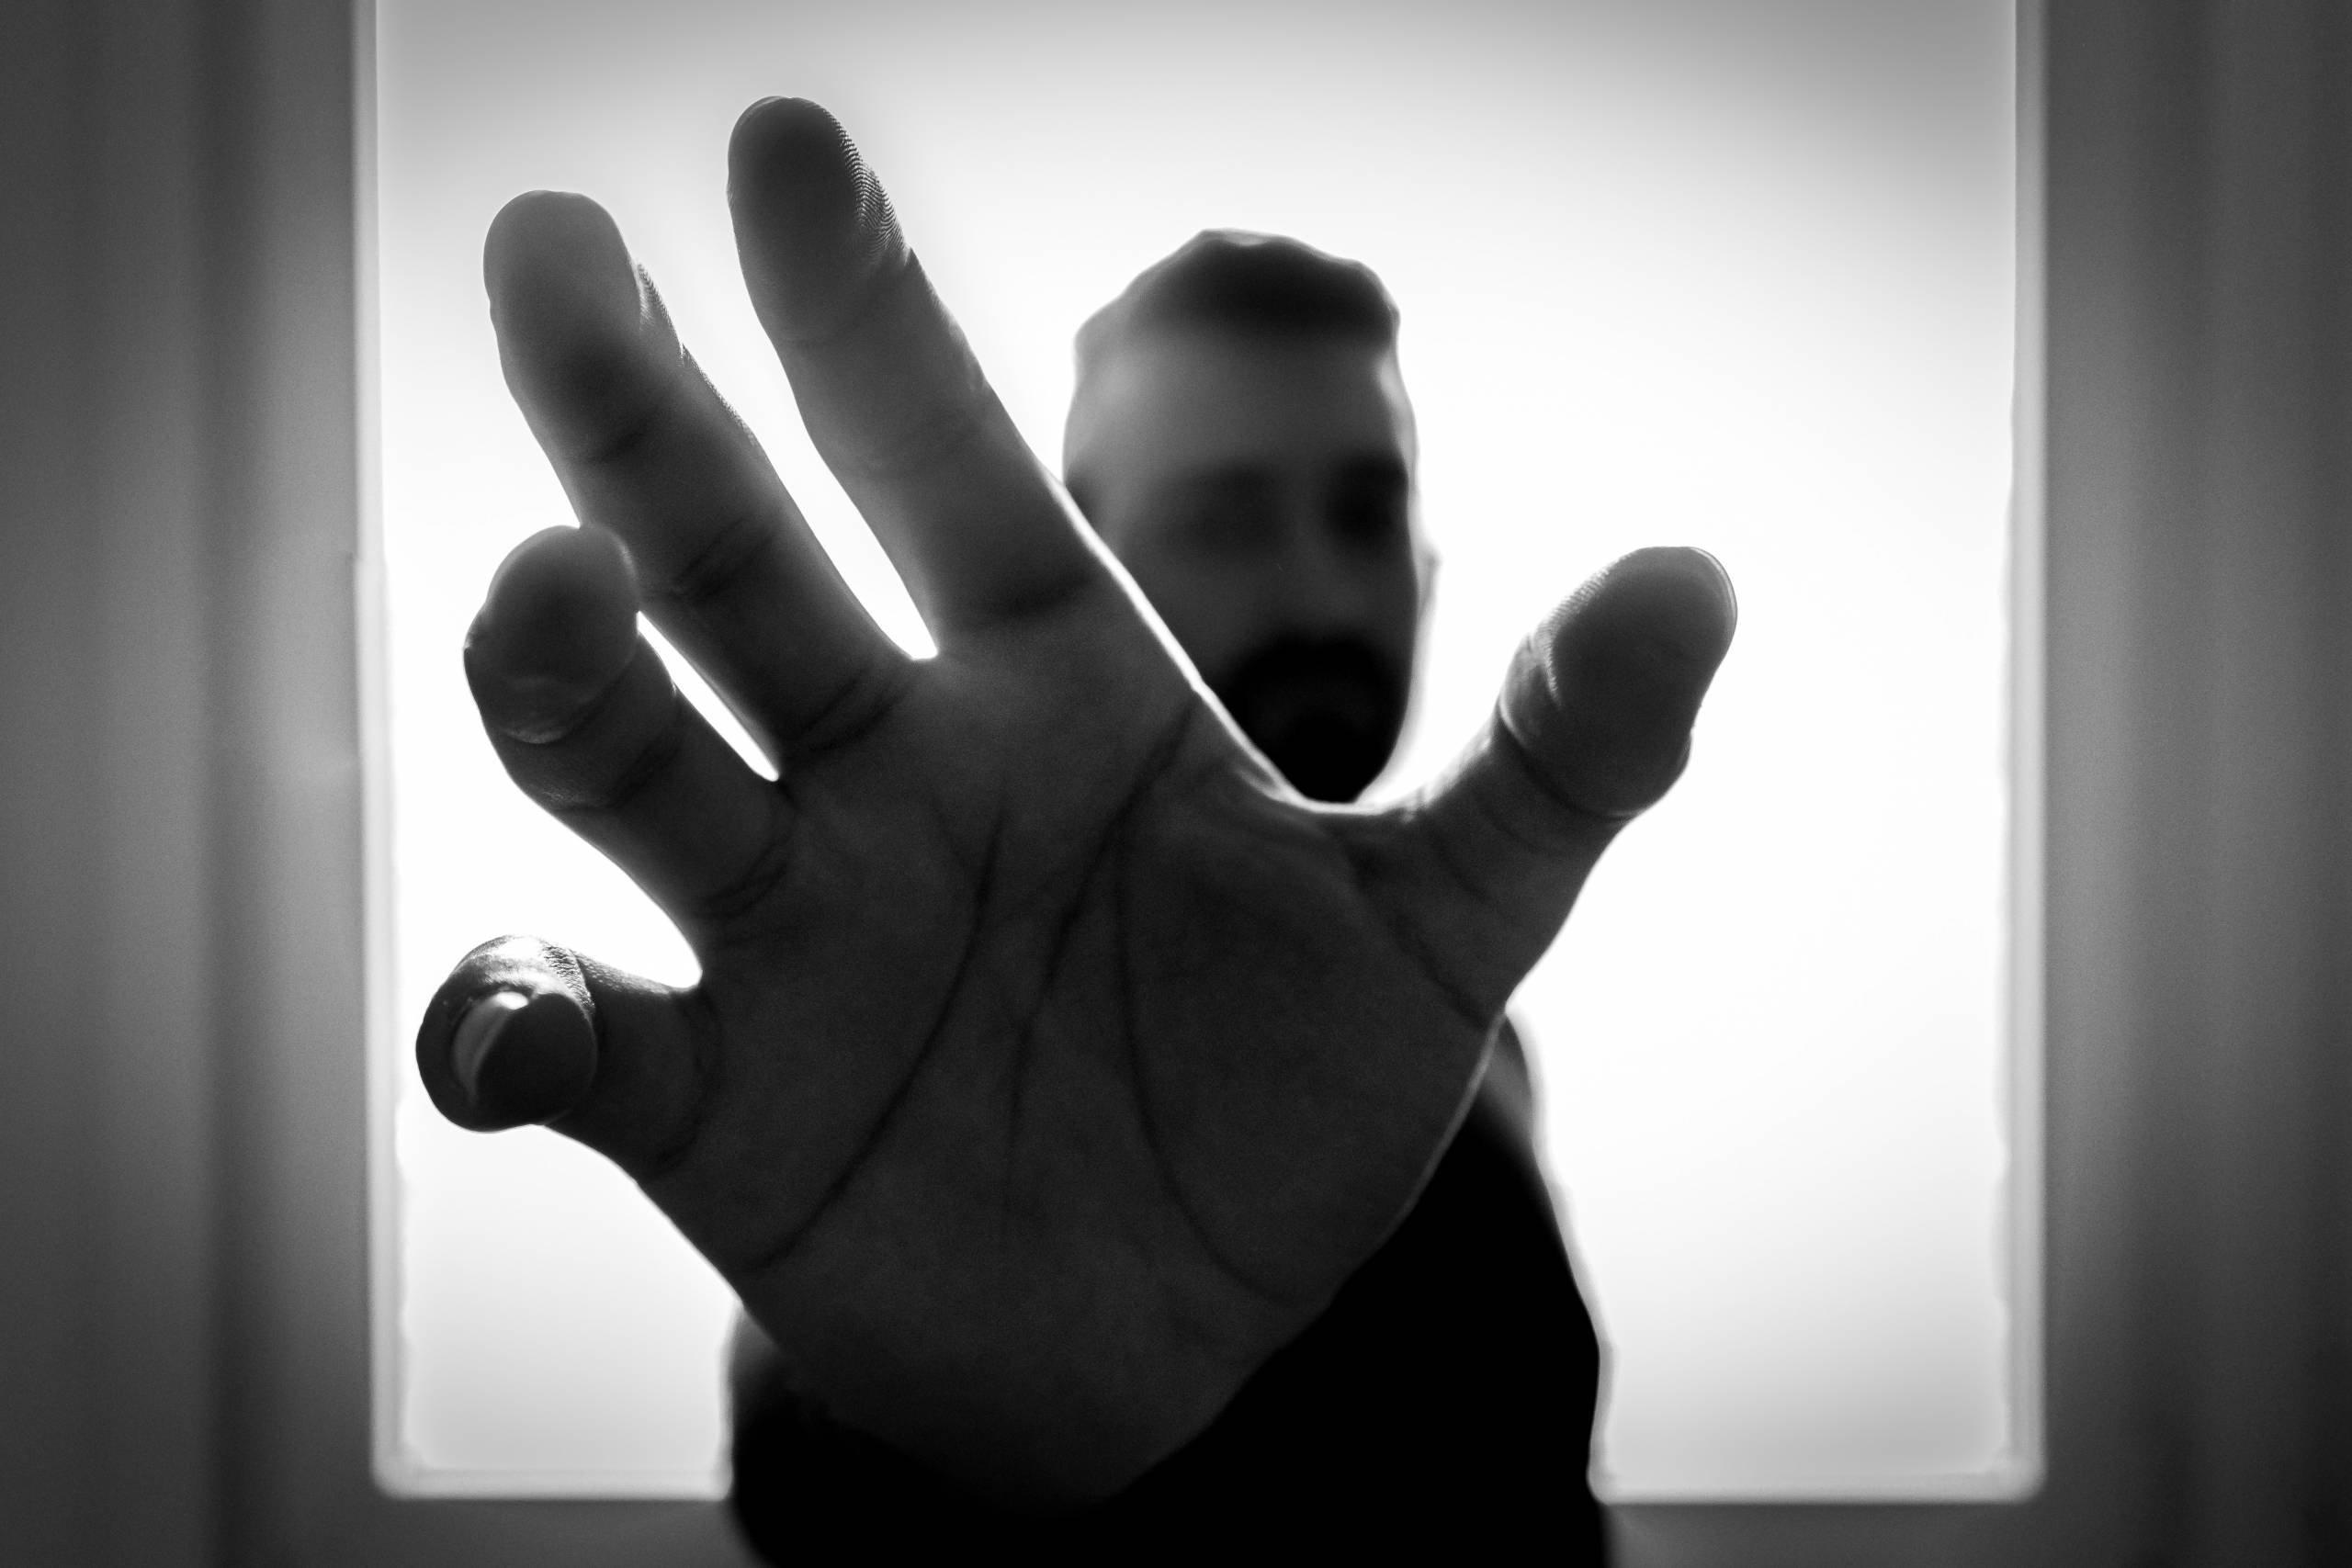 man with trigger finger